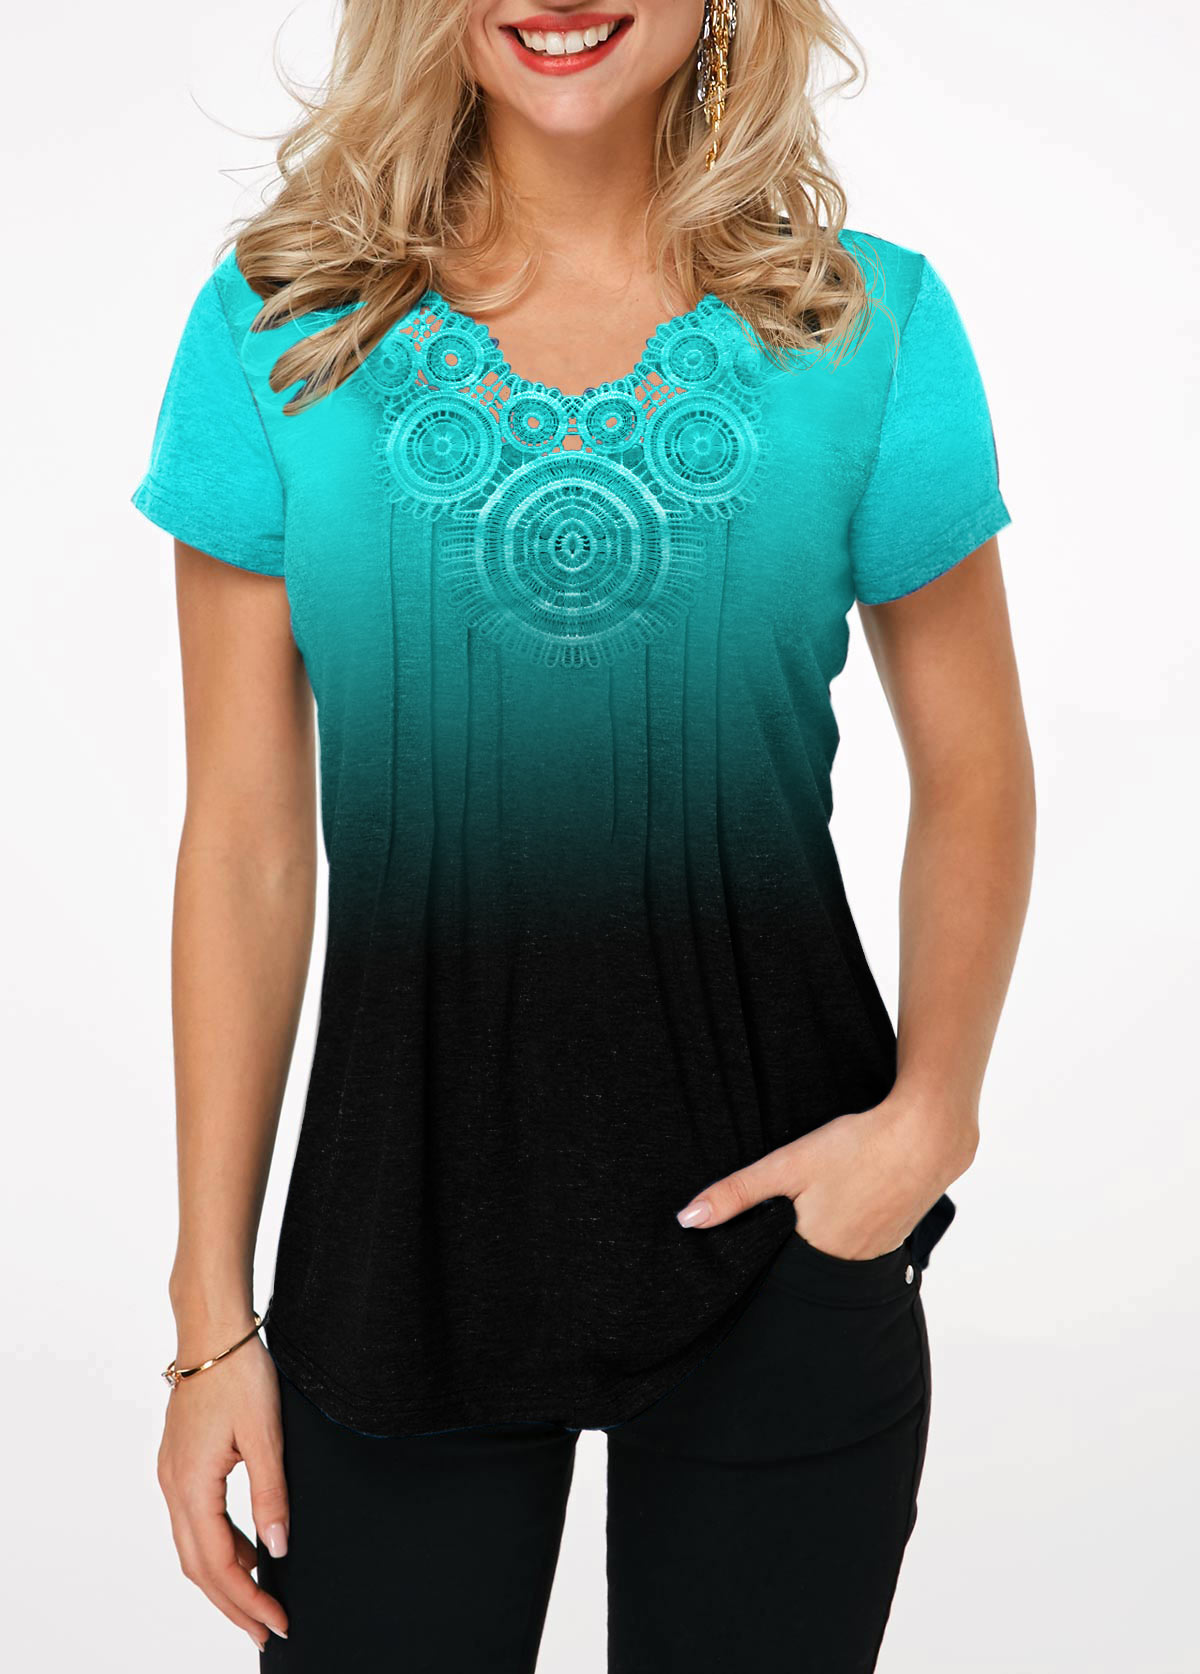 Lace Panel Cyan Gradient Short Sleeve T Shirt